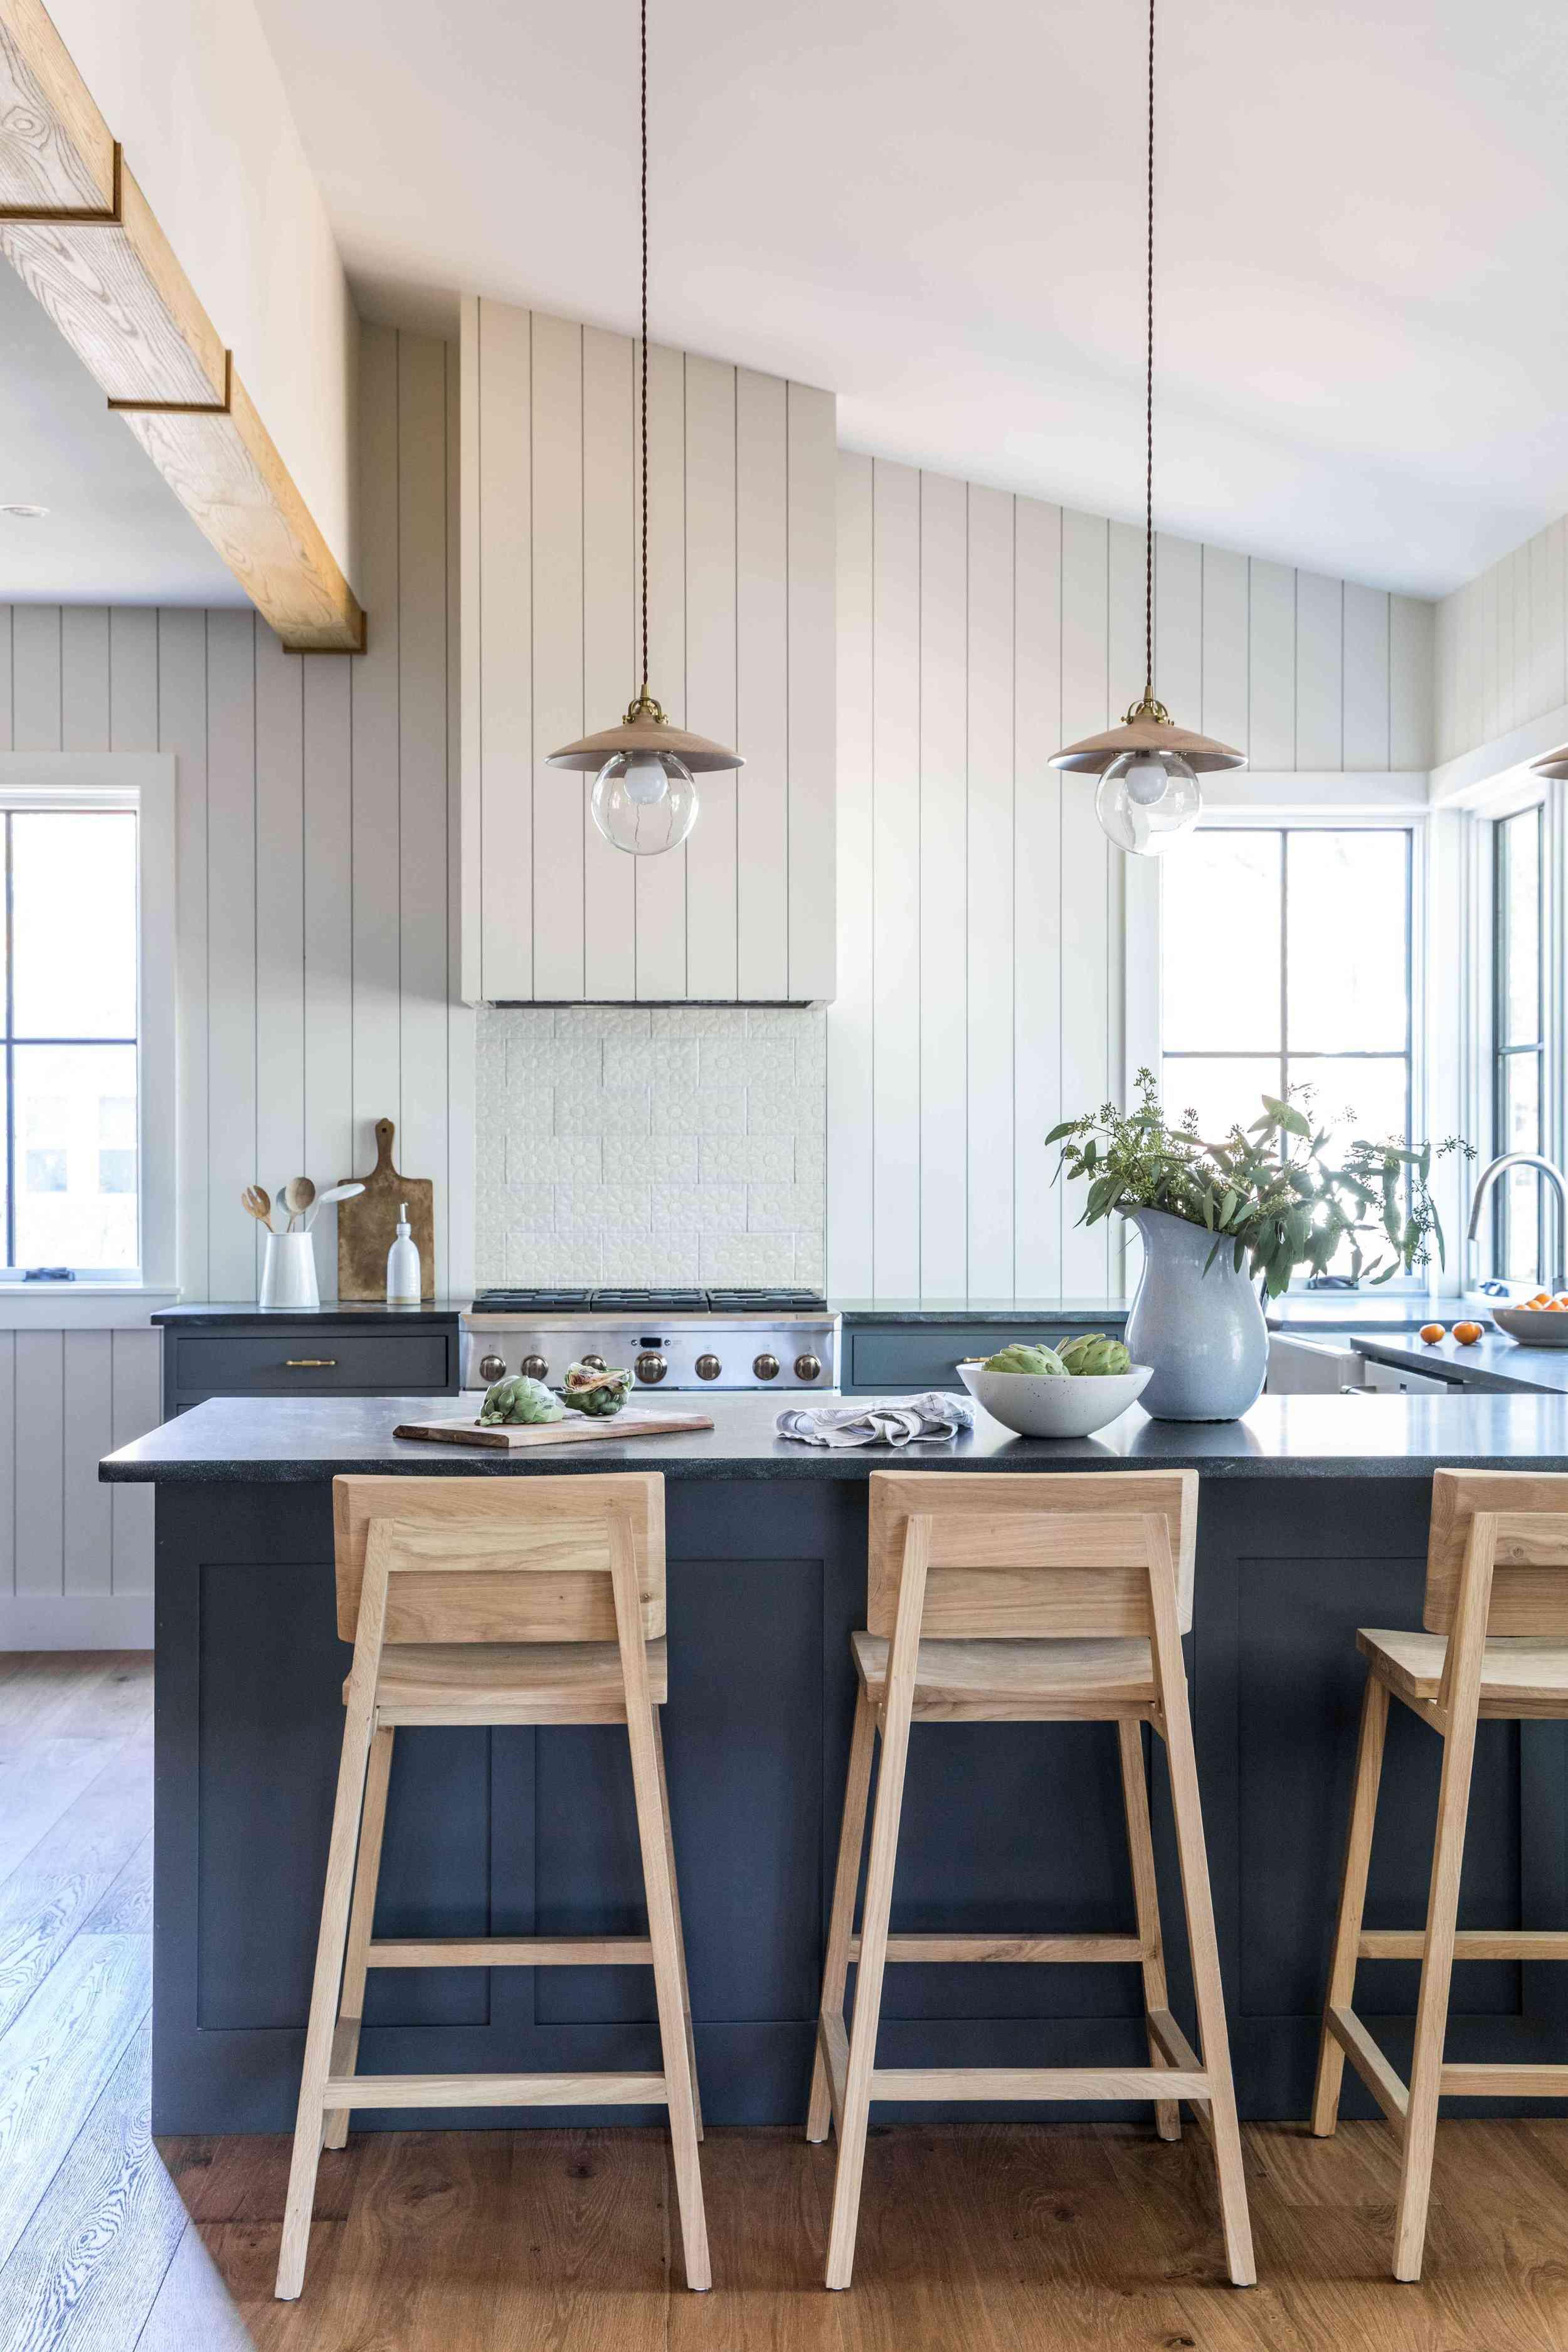 best kitchen ideas - blue and white rustic kitchen in maine